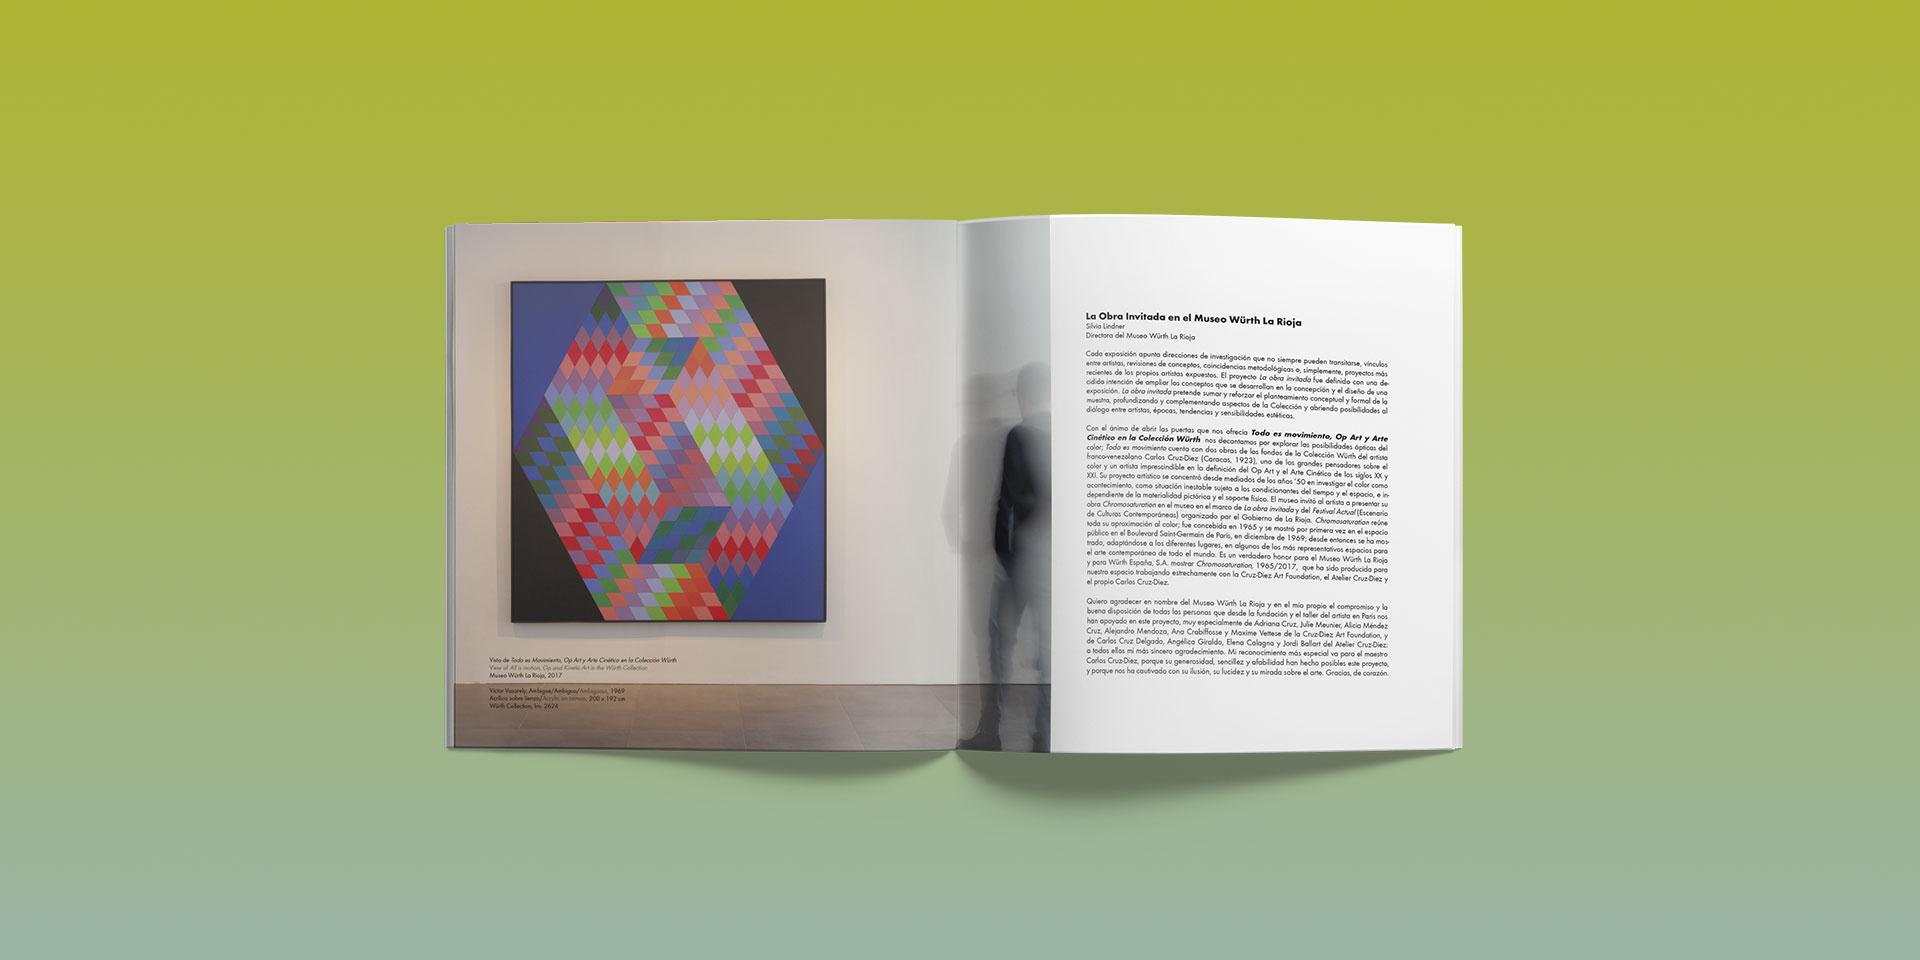 detalle catalogo exposicion chromosaturation museo wurth la rioja